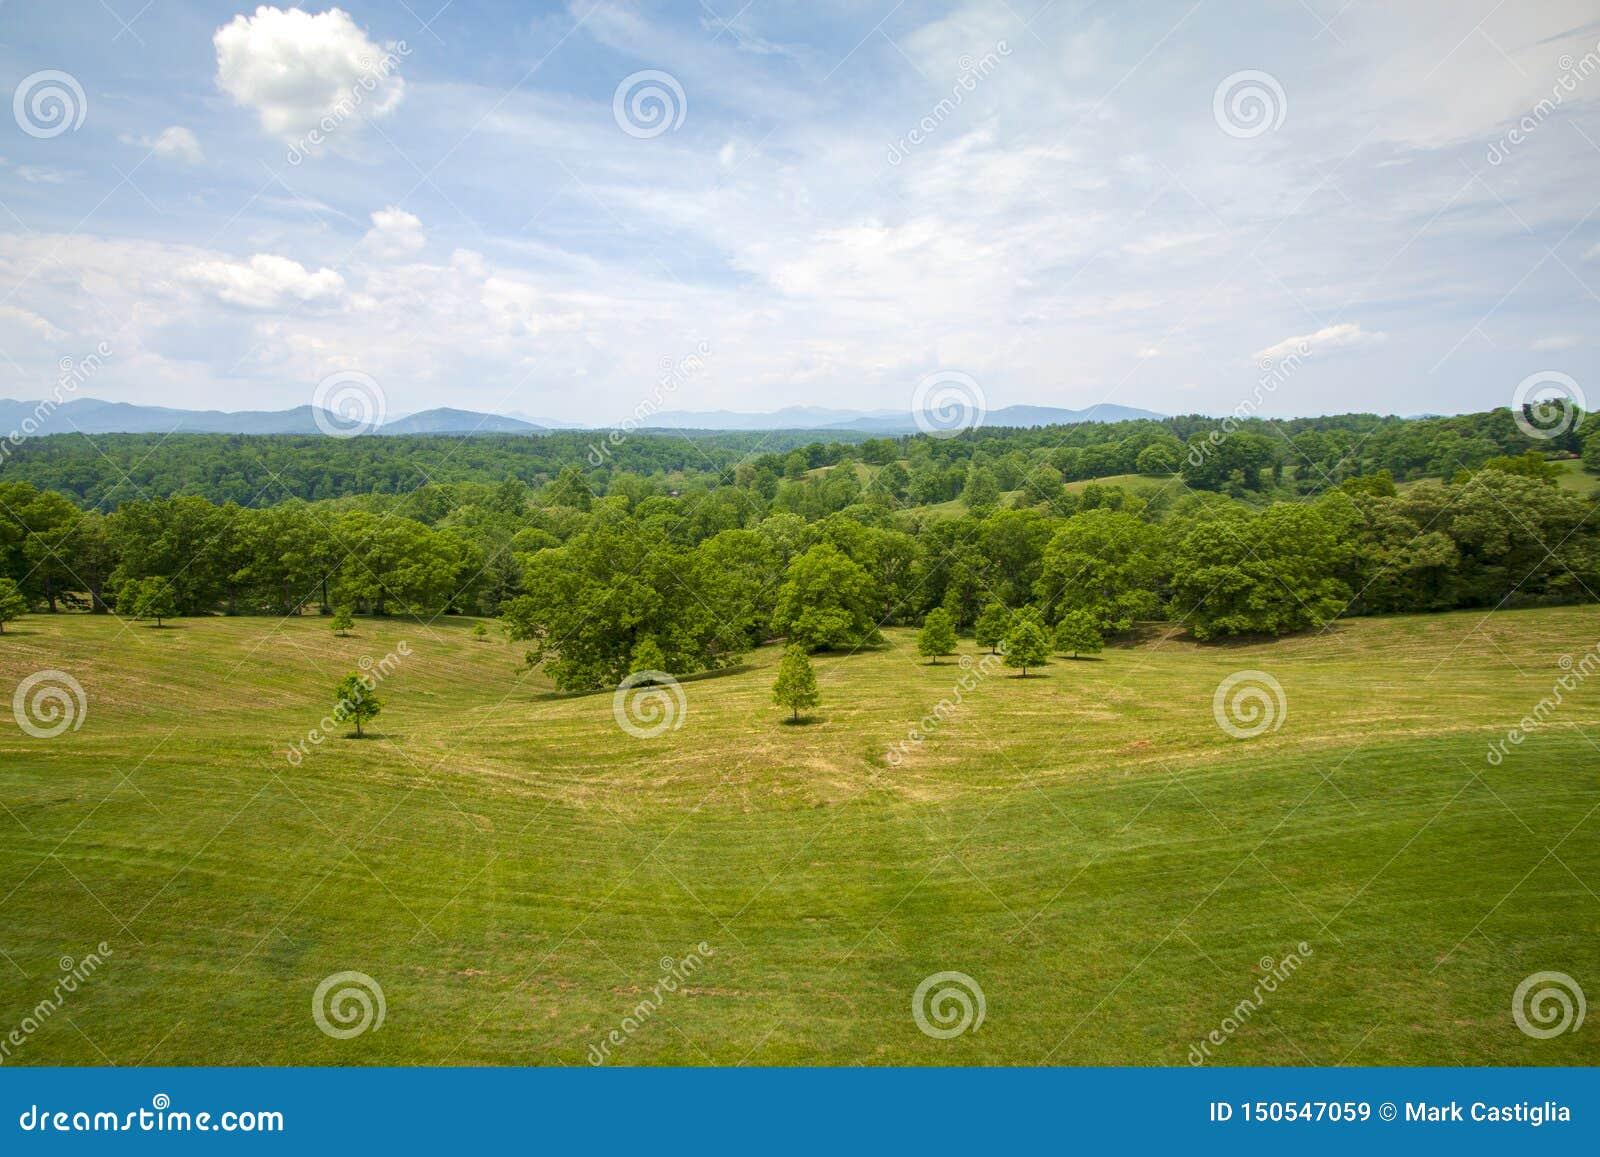 Vers gemaaid gebied met forst en verre bergen op achtergrond onder heldere blauwe hemel